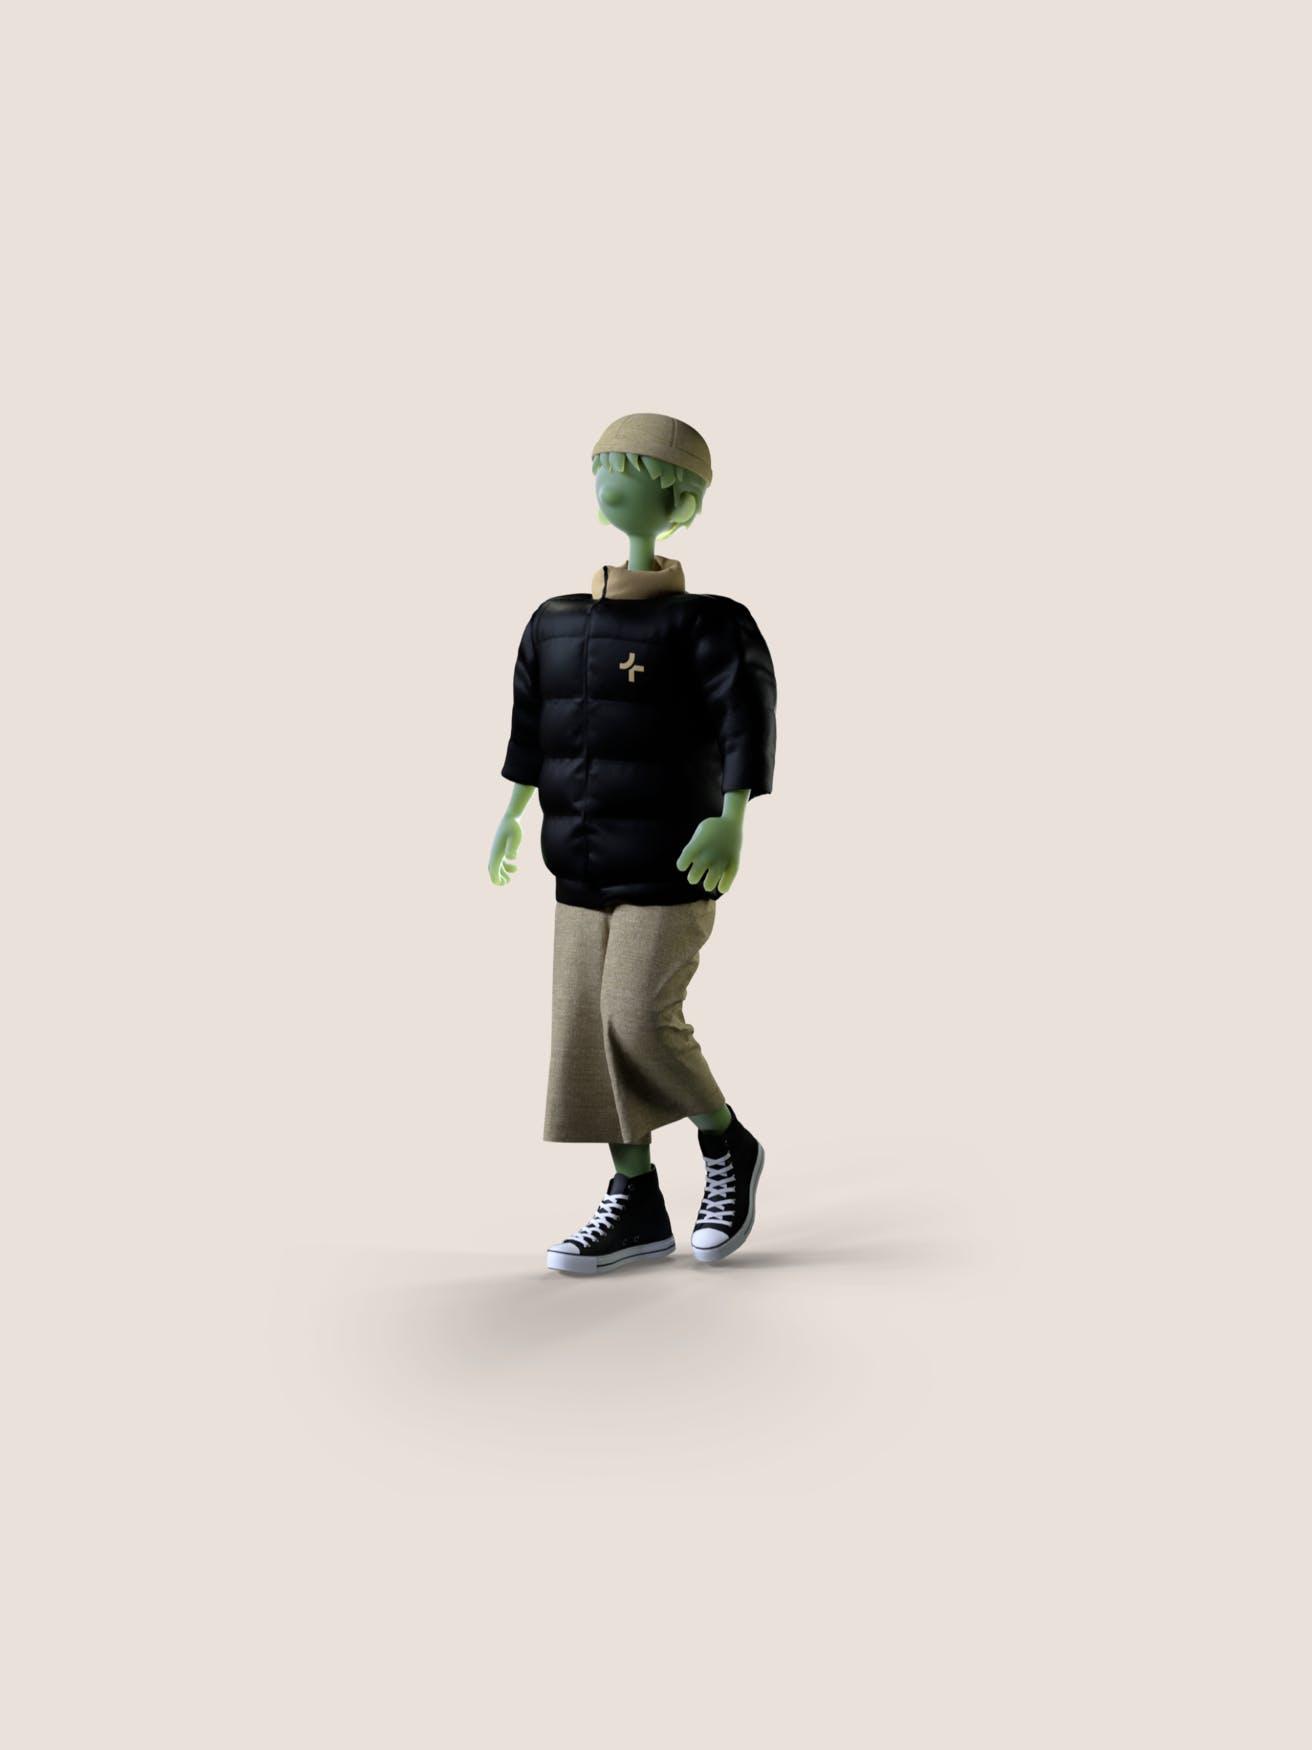 Cover - Jameen Tarlier - 3D Character